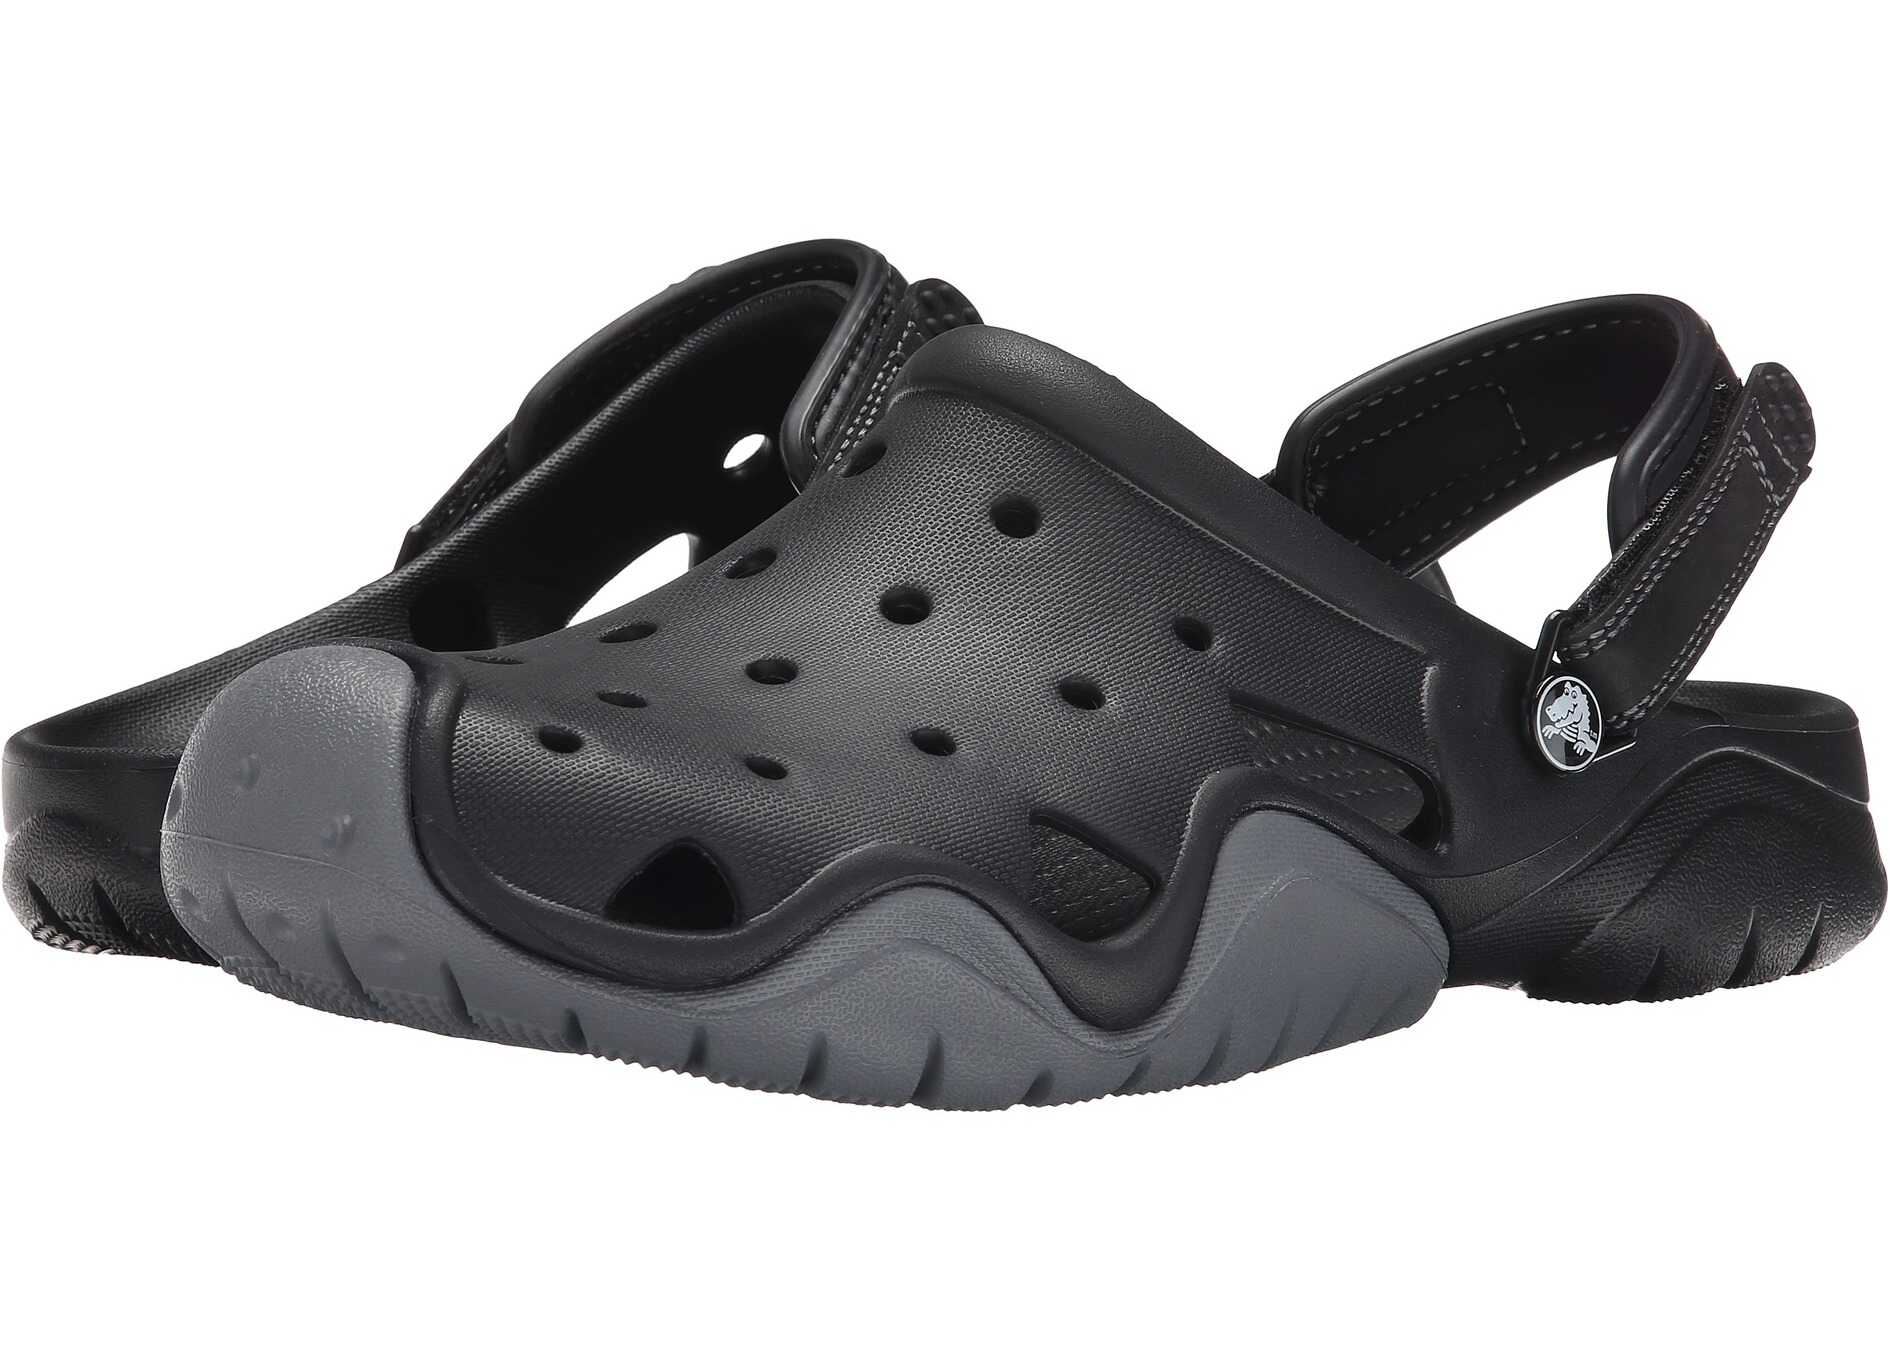 Crocs Swiftwater Clog Black/Charcoal